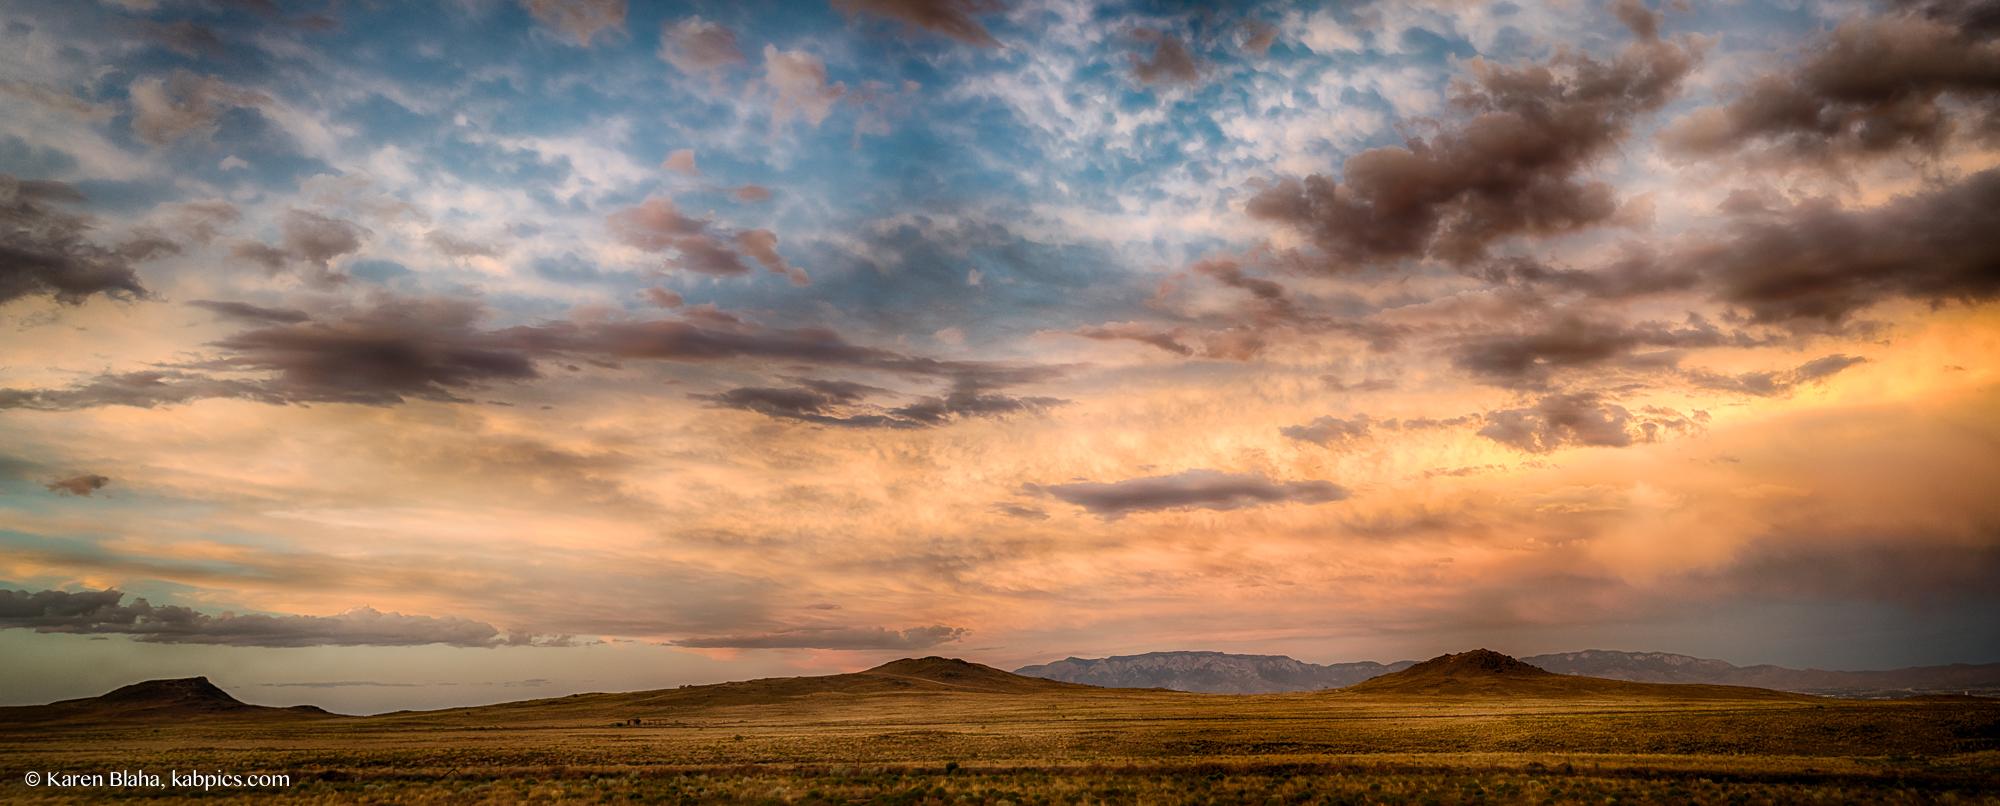 160707-sunset-2303_HDR-2 2